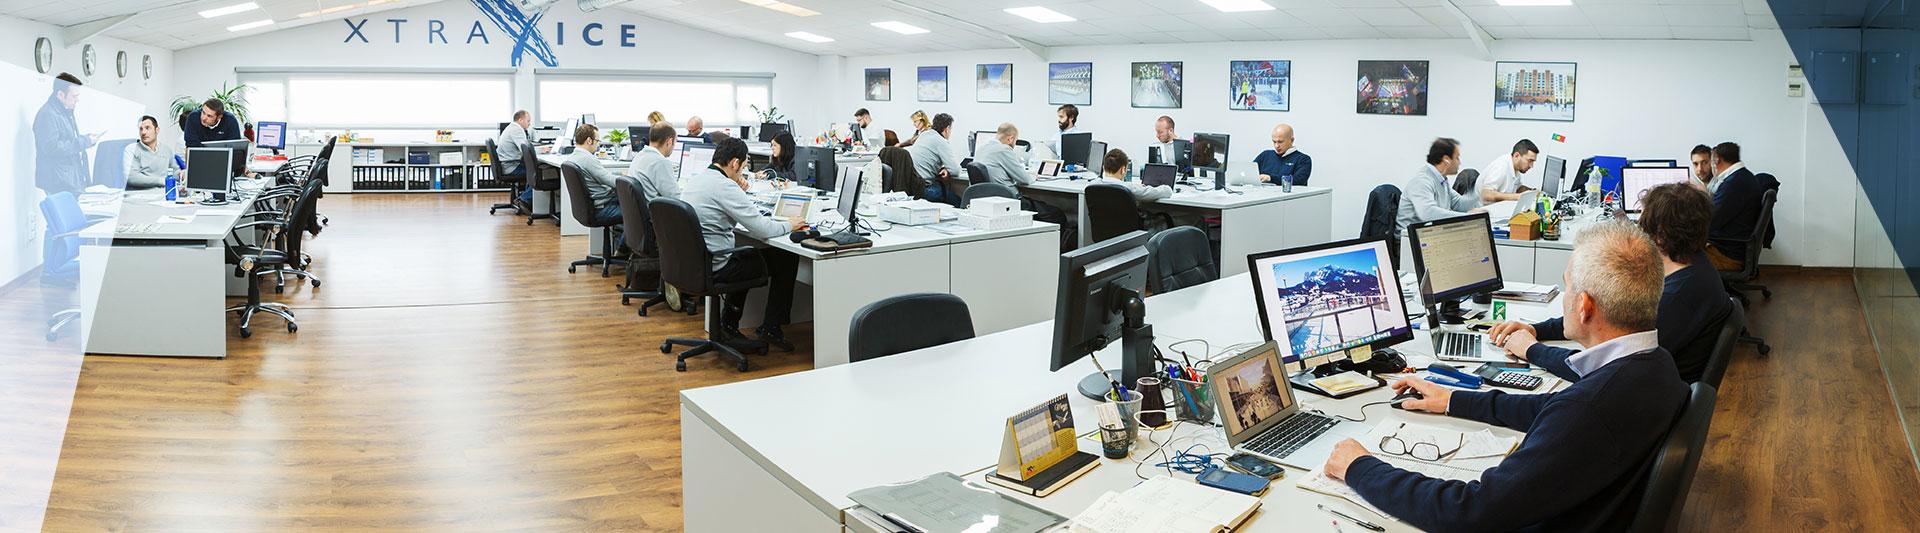 La oficina de Xtraice acoge más de 20 nacionalidades Les bureaux d'Xtraice regroupent plus de 20 nationalités.